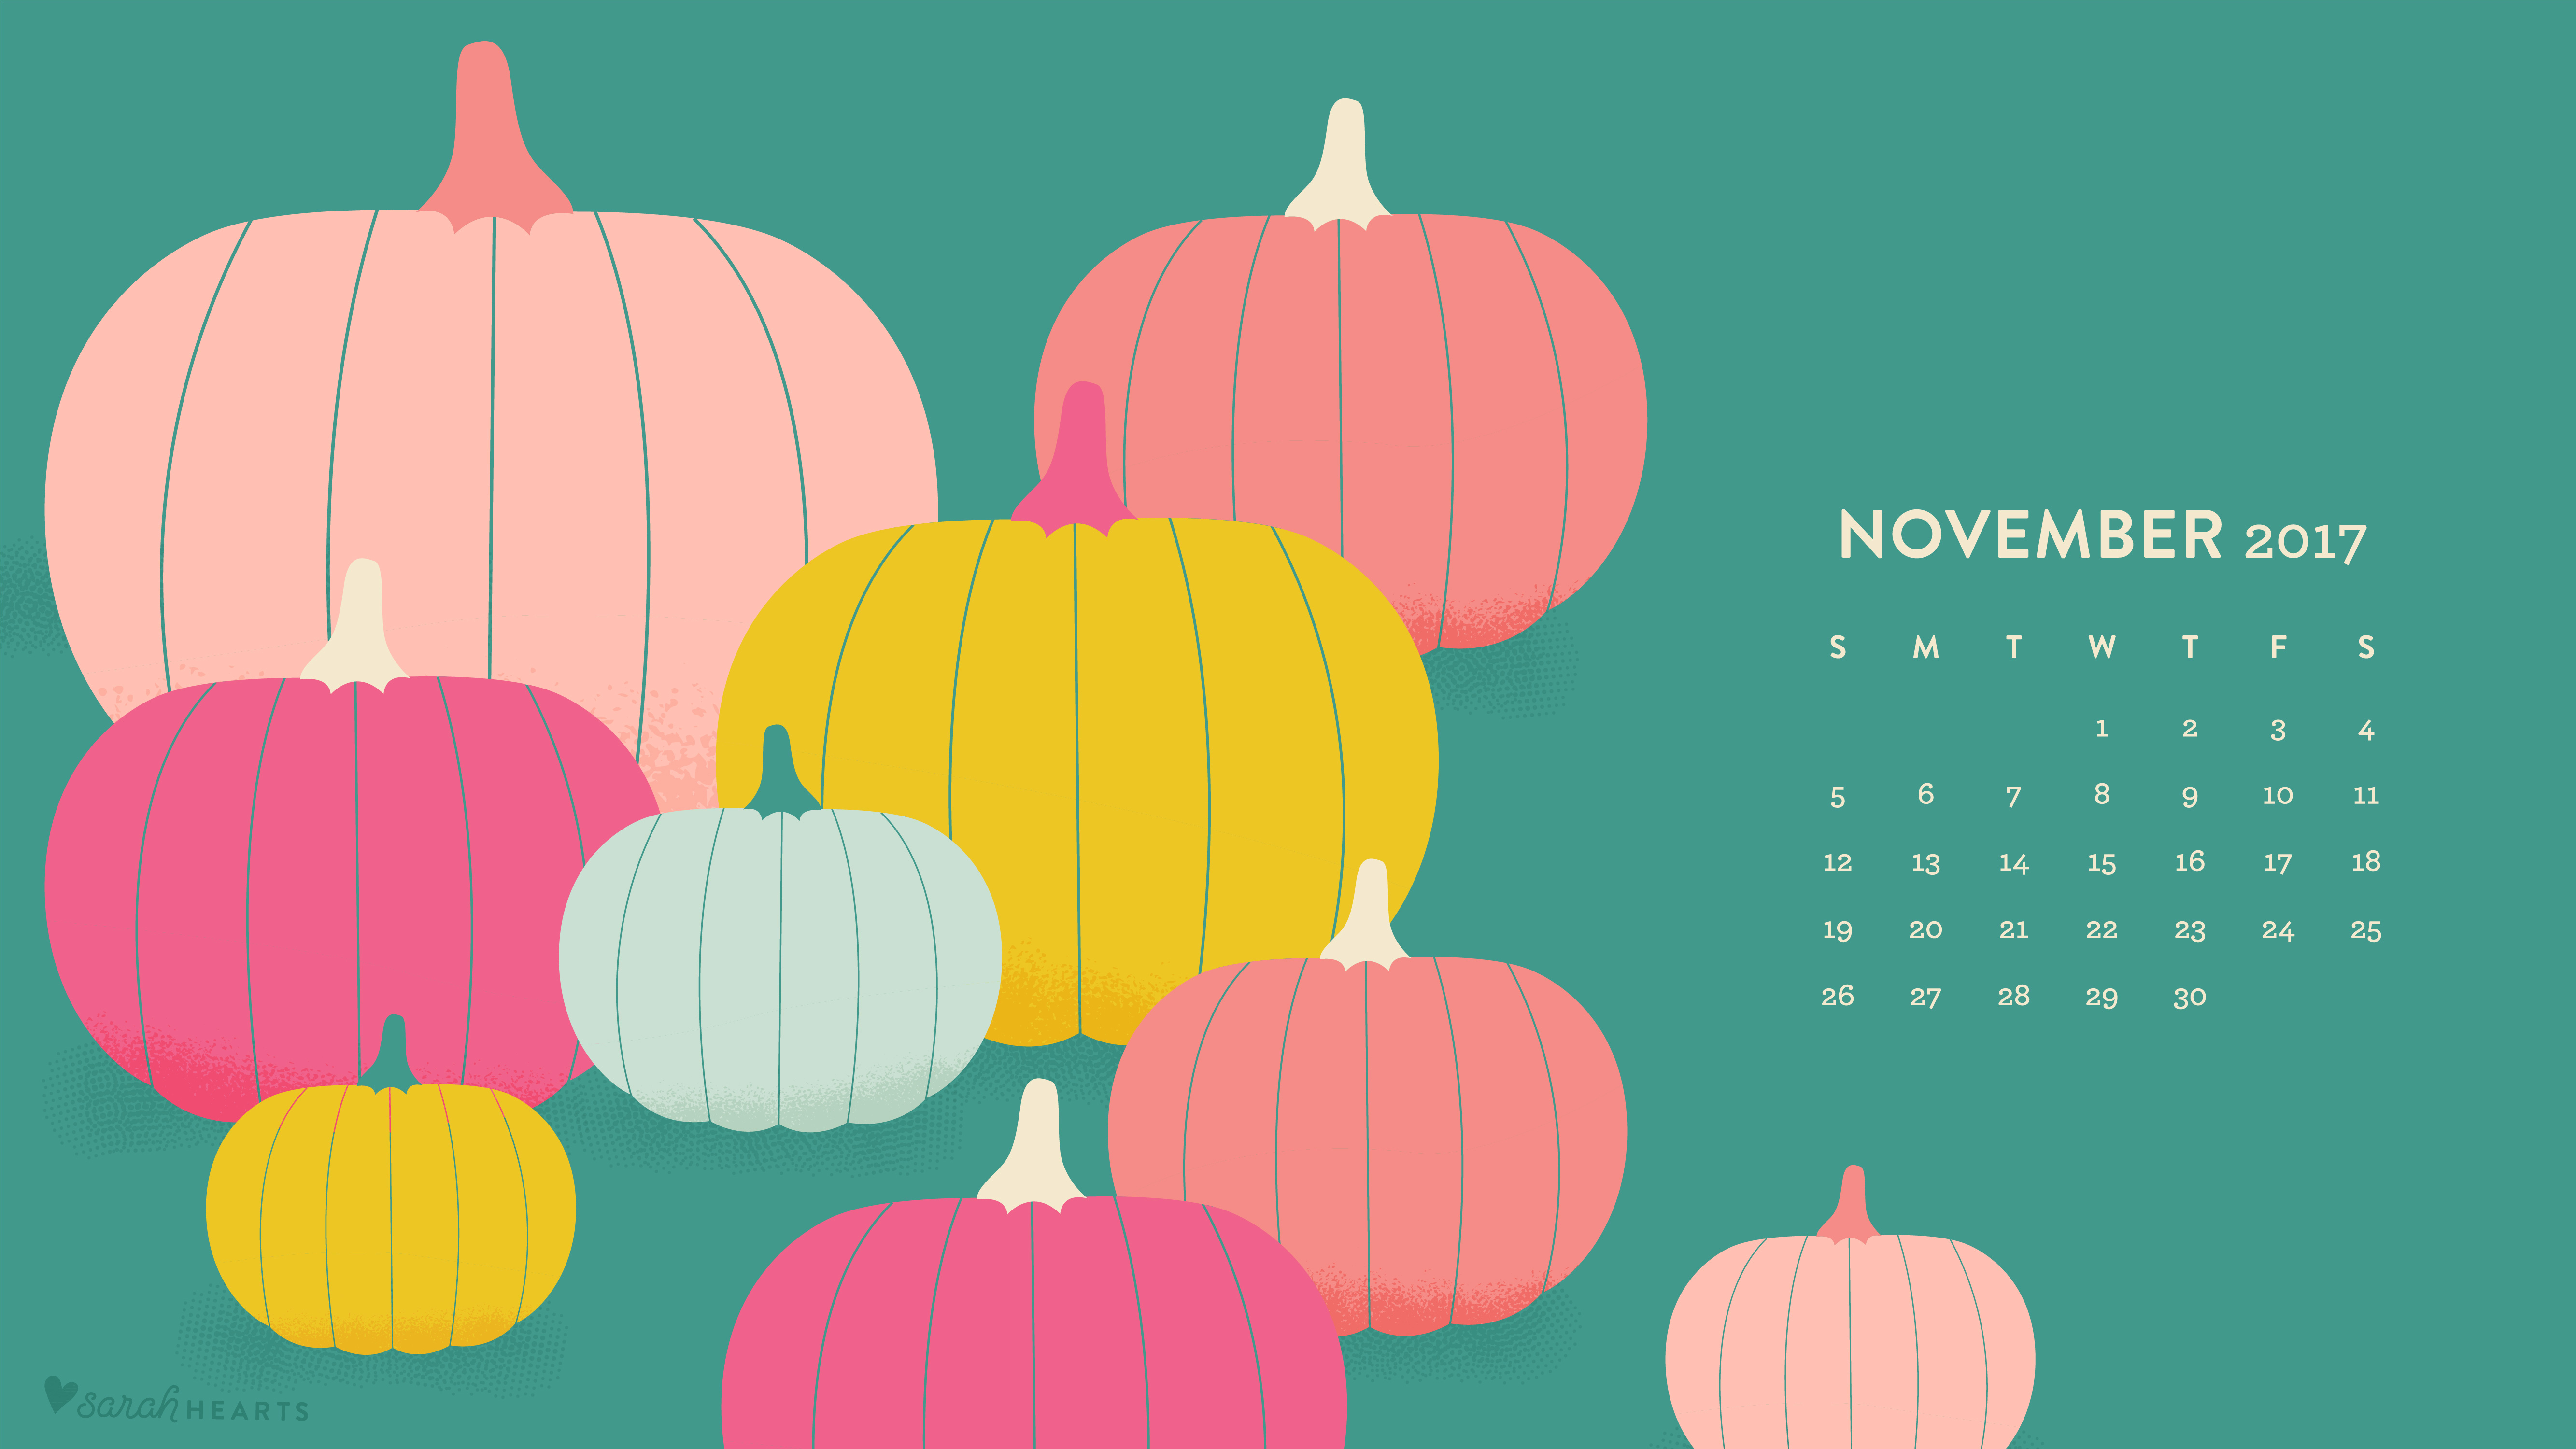 Fall Autumn Computer Wallpaper November 2017 Pumpkin Calendar Wallpaper Sarah Hearts